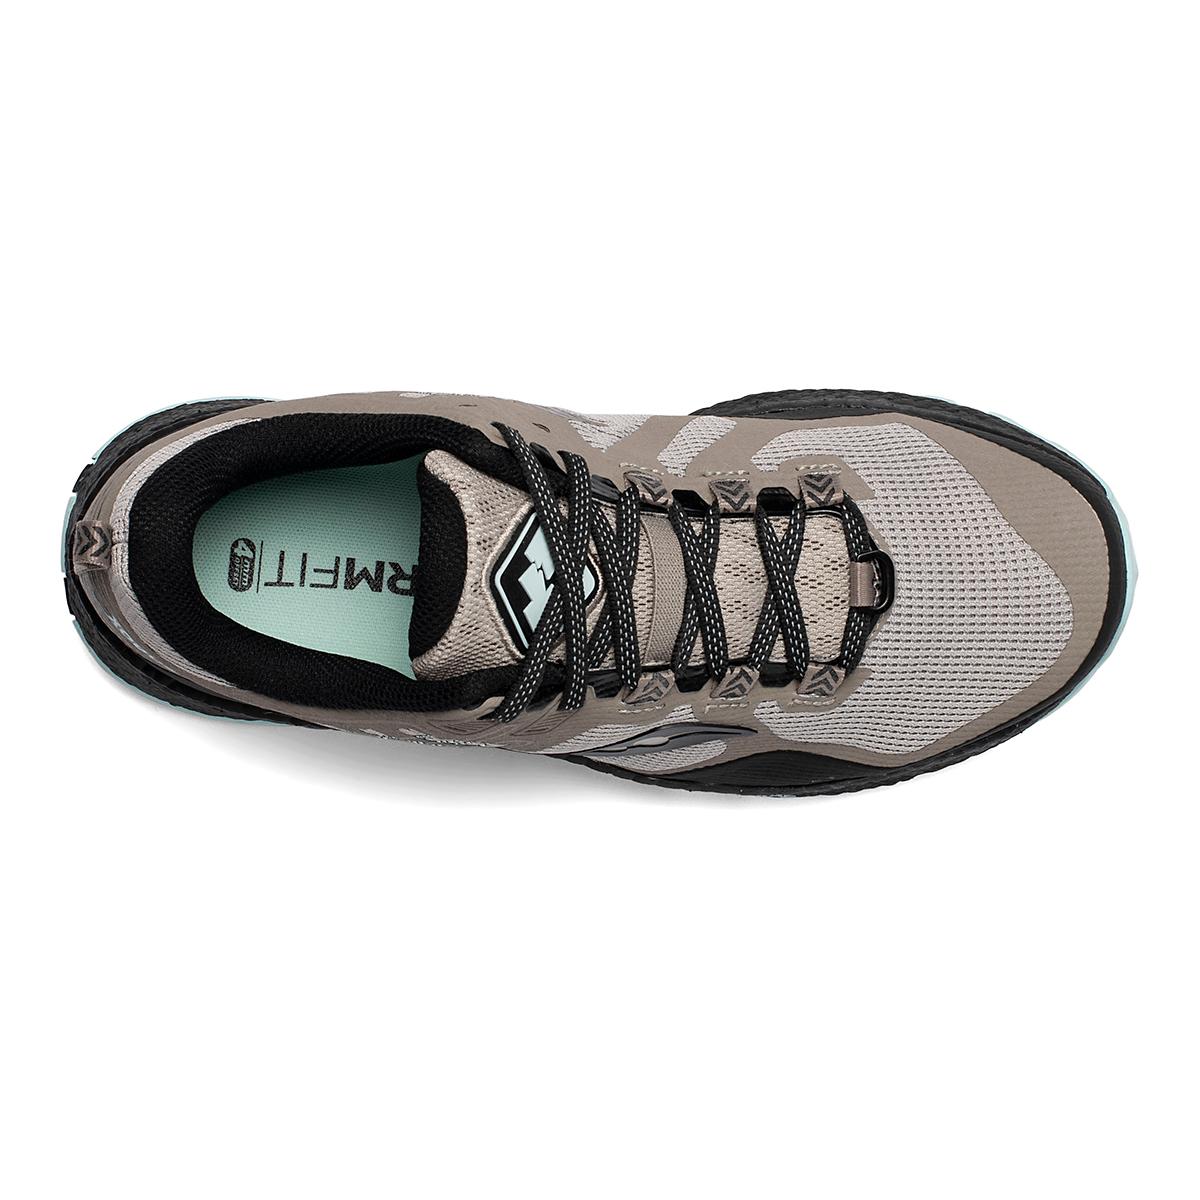 Women's Saucony Xodus 10 Trail Running Shoe - Color: Moonrock/Black - Size: 5 - Width: Regular, Moonrock/Black, large, image 3